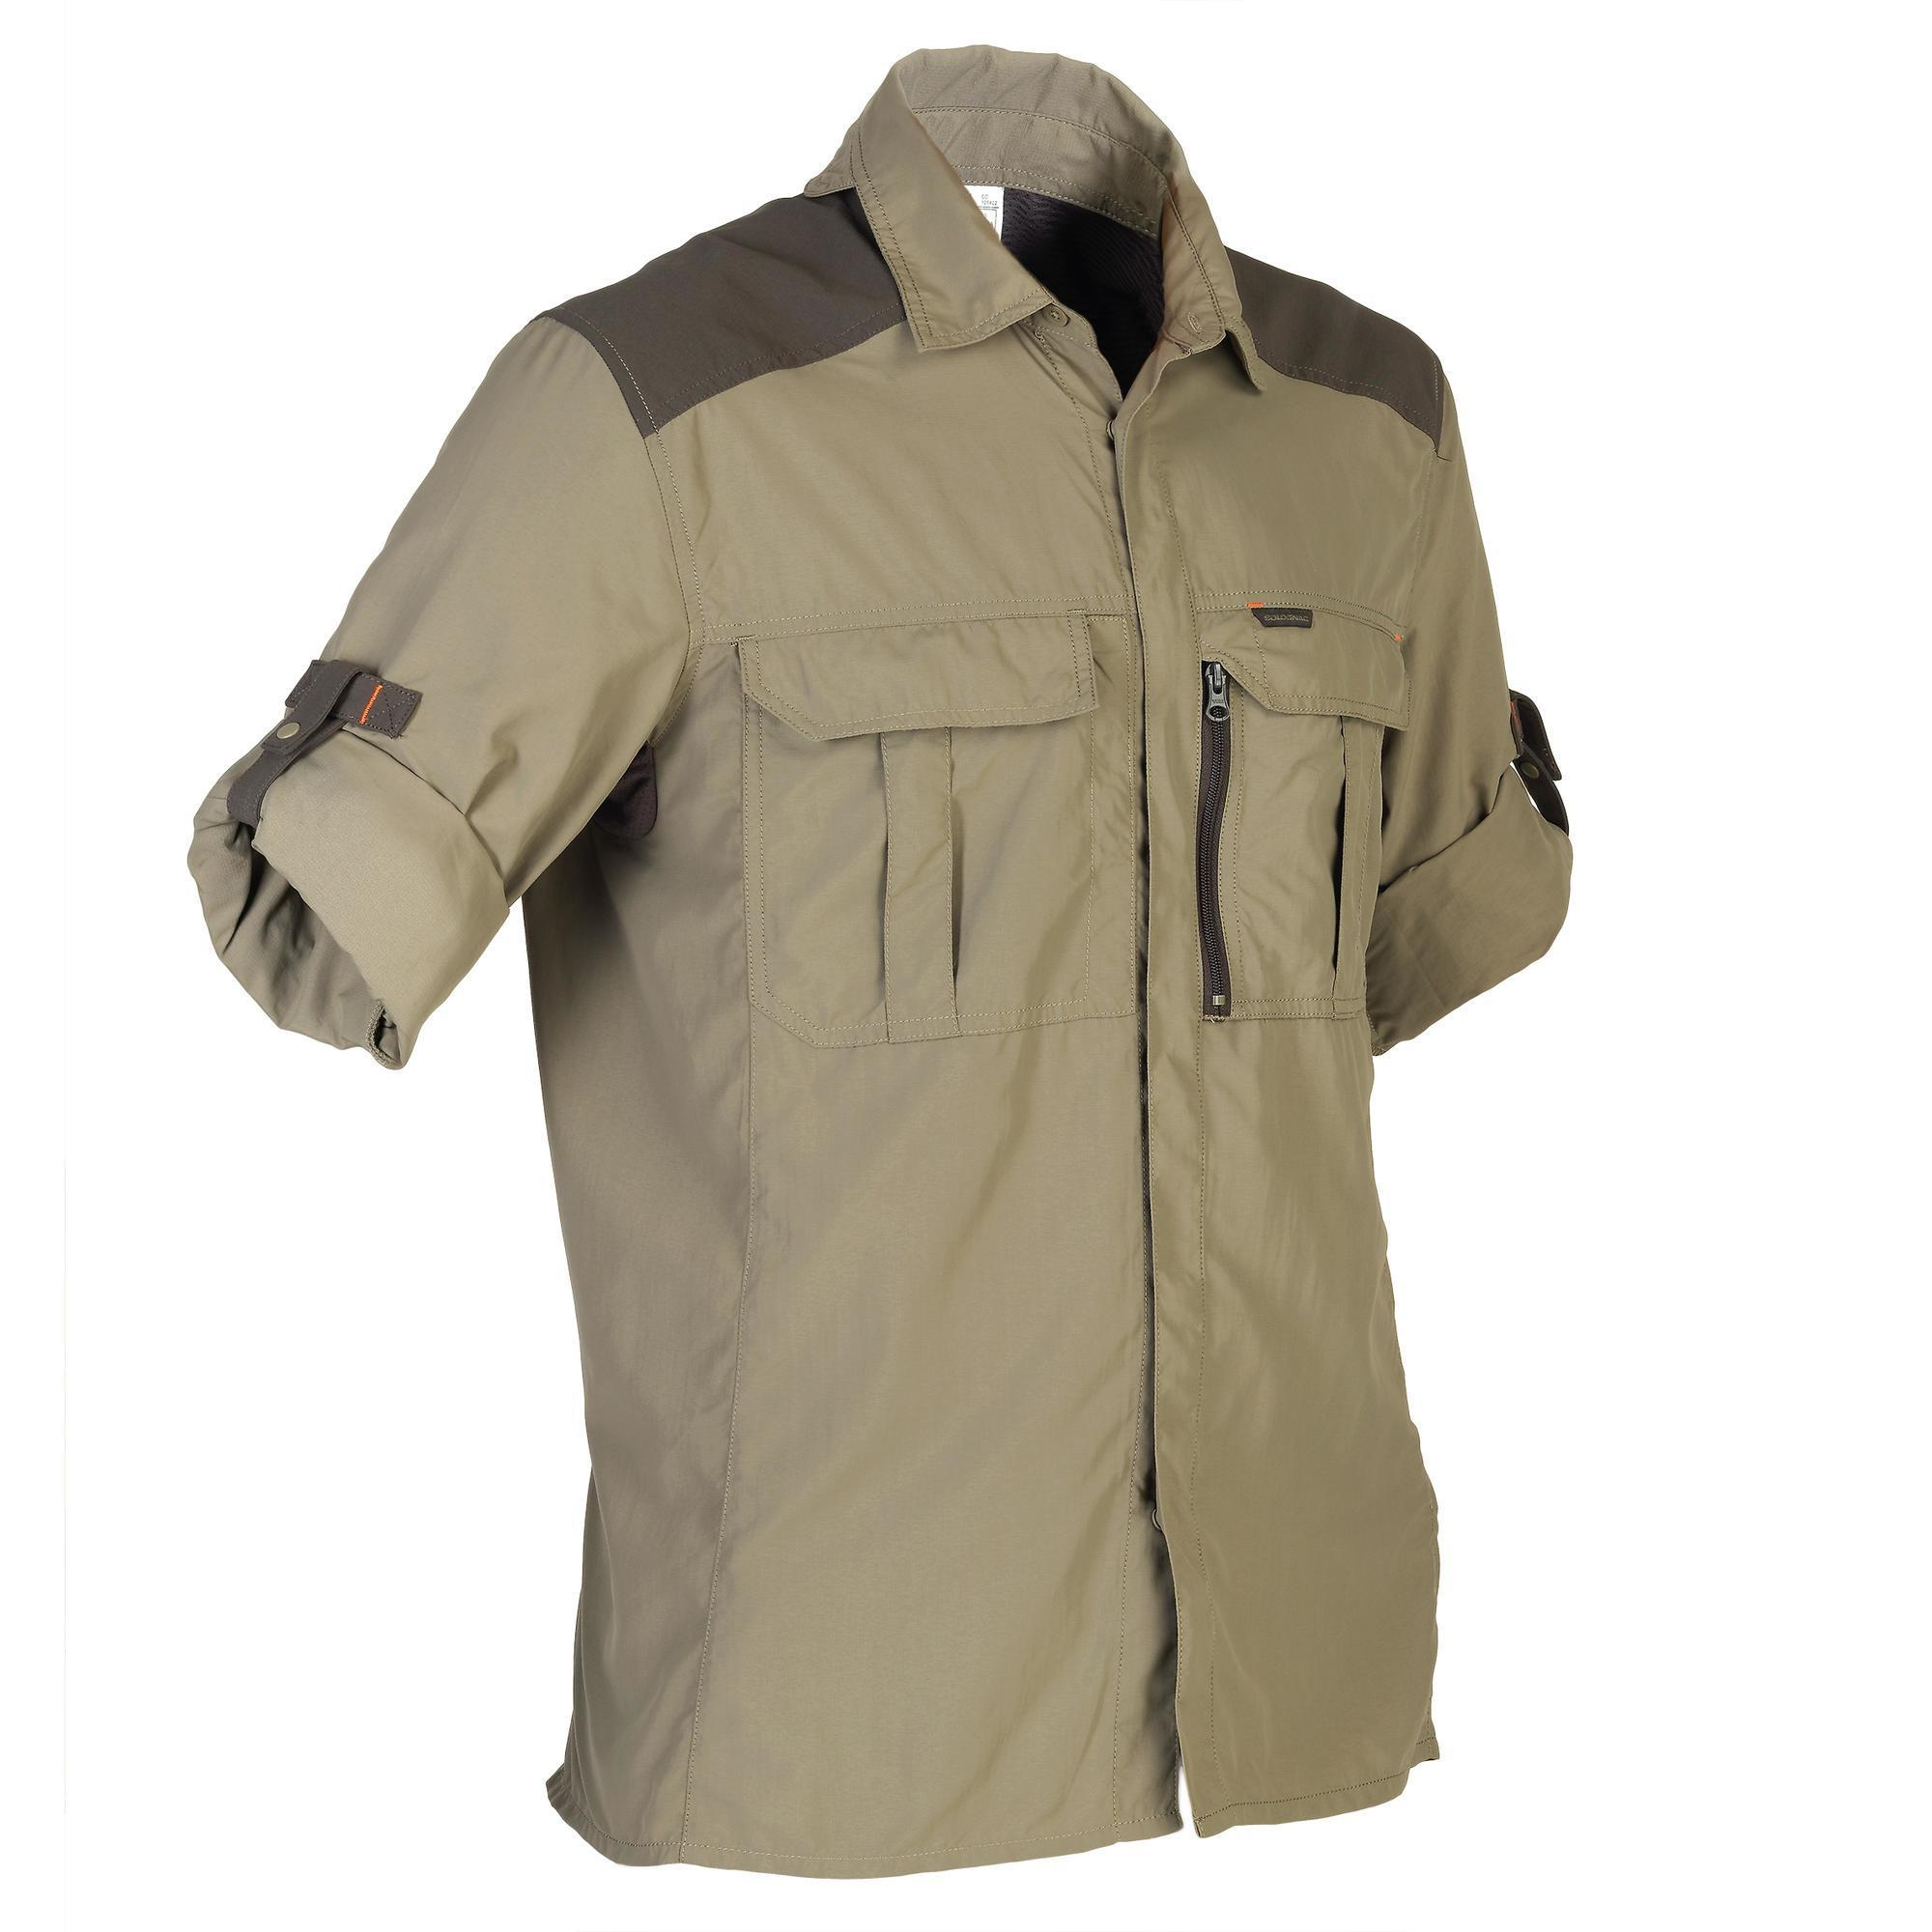 Herren Jagdhemd SG900 langarm khaki Herren | 03583788169437